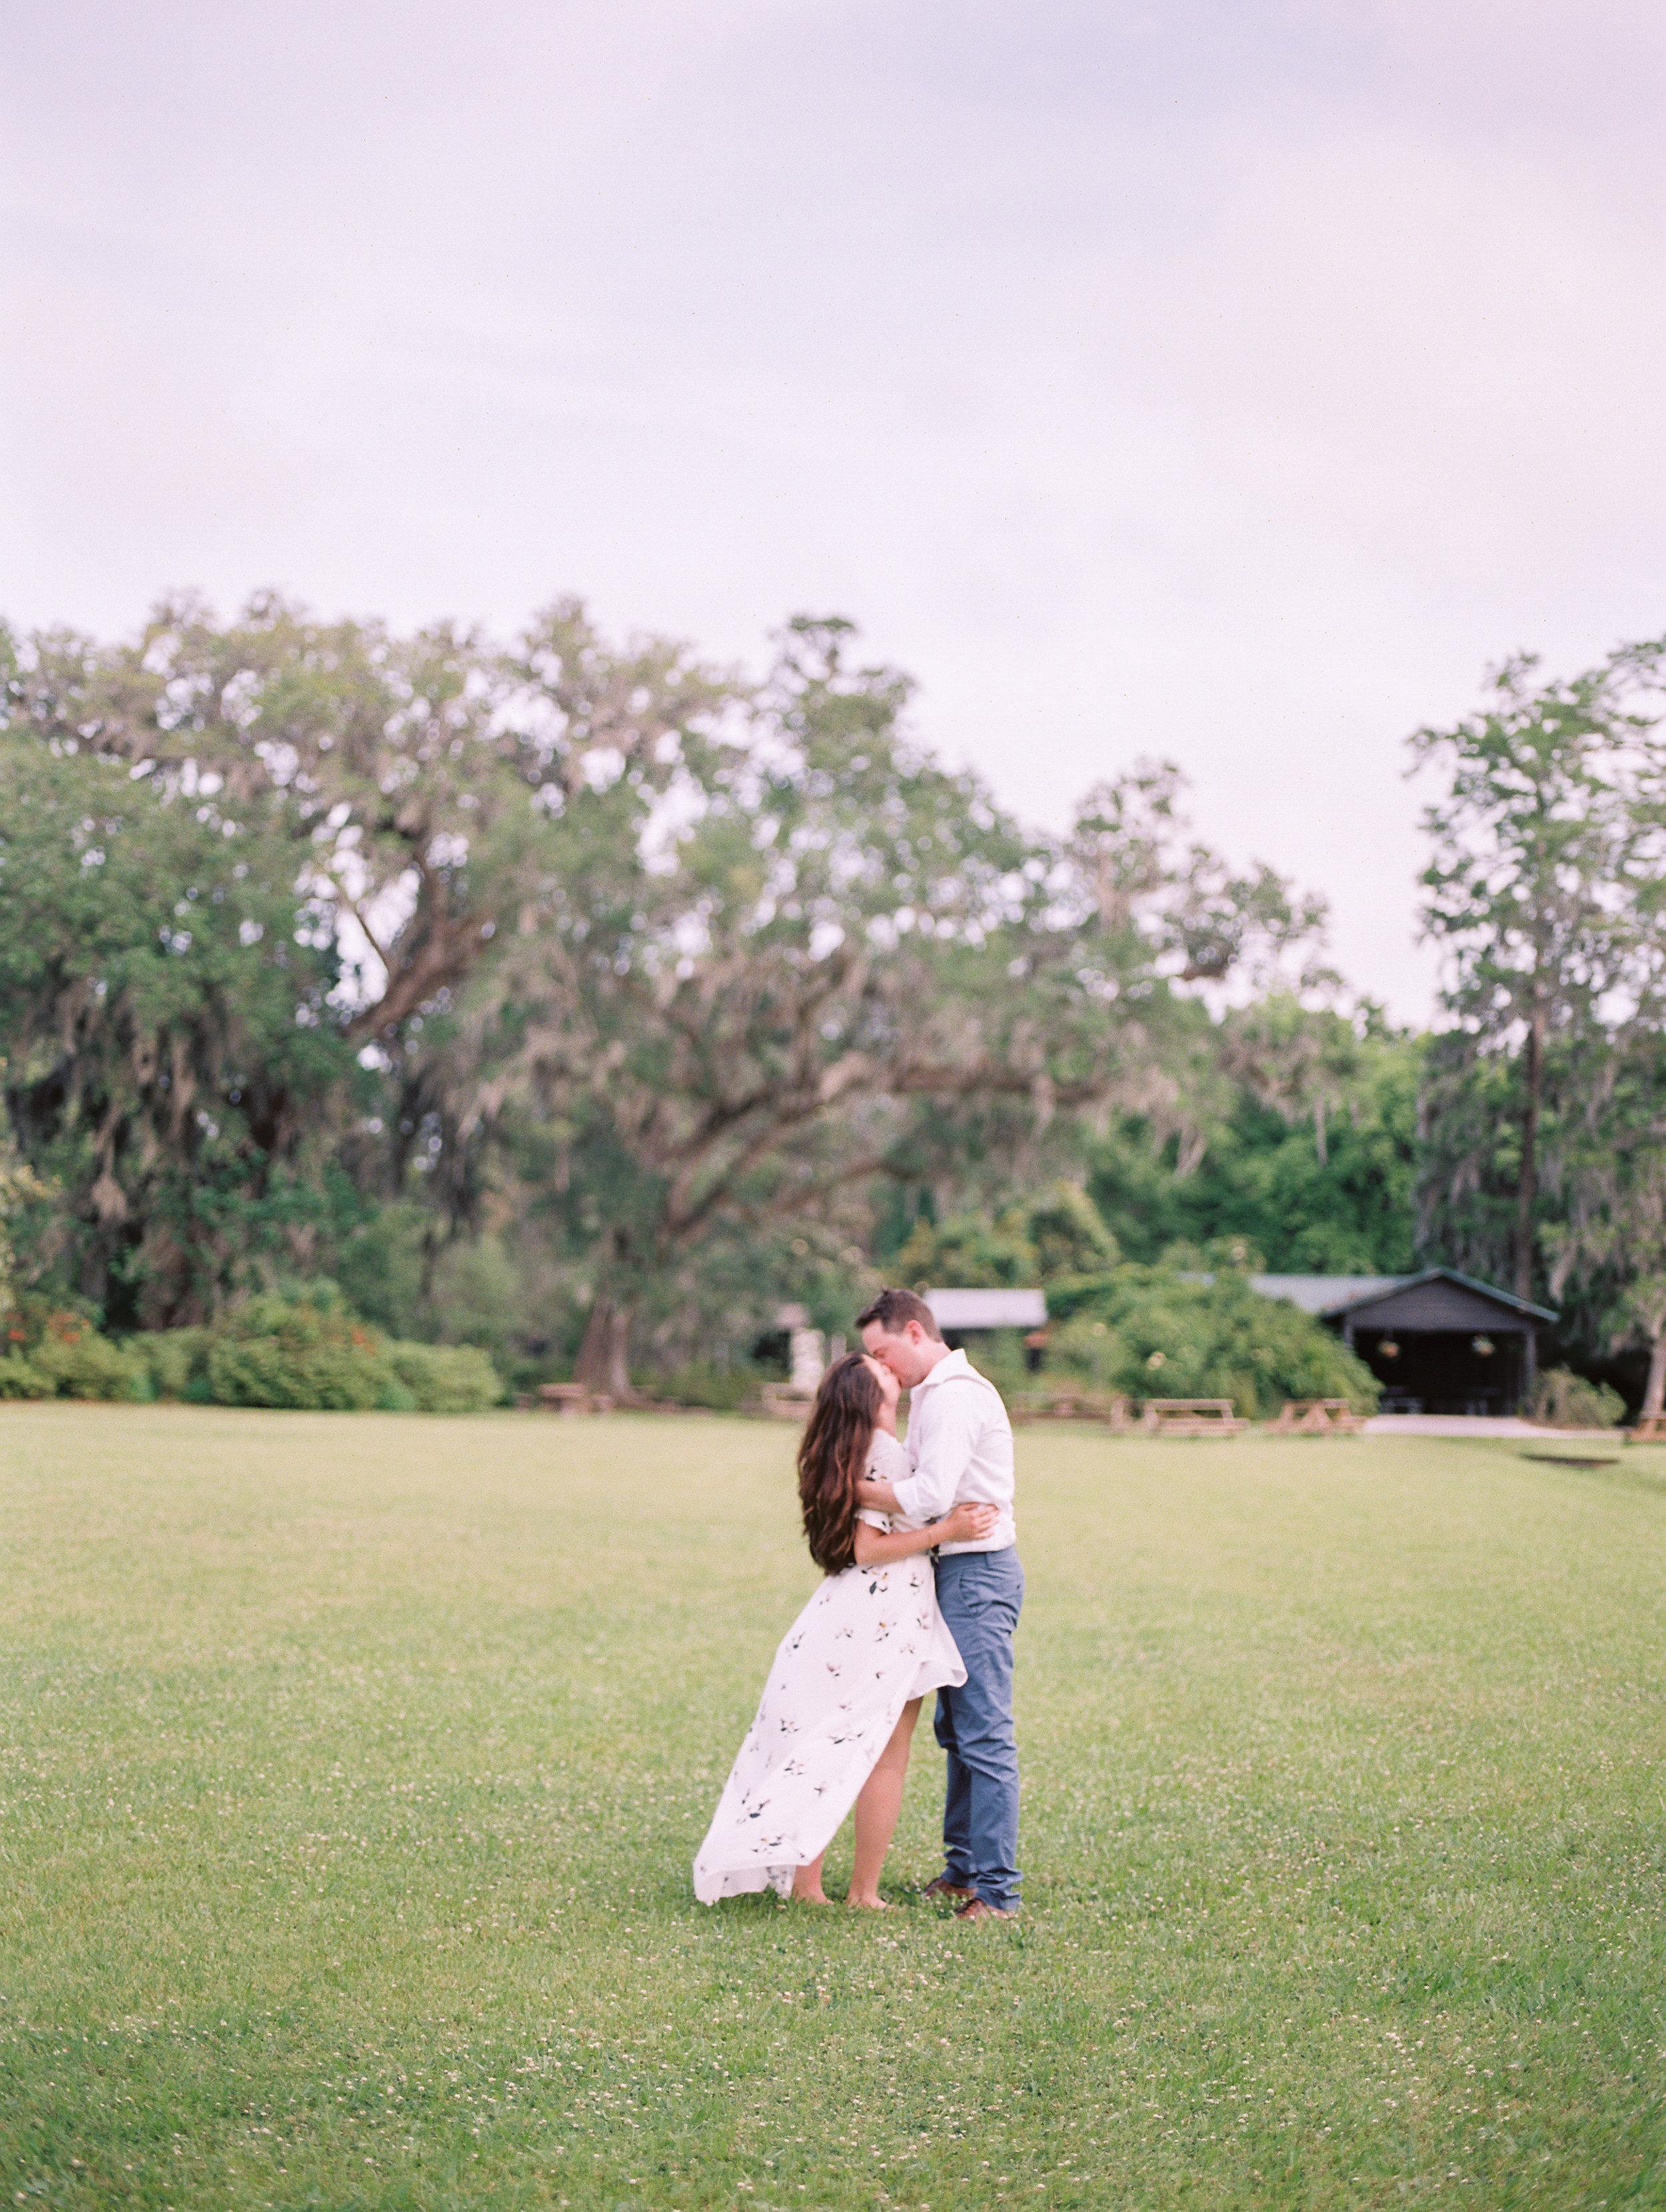 Charleston, South Carolina Wedding Venue - Magnolia Plantation Engagement Photos -- Wedding Blog - The Overwhelmed Bride